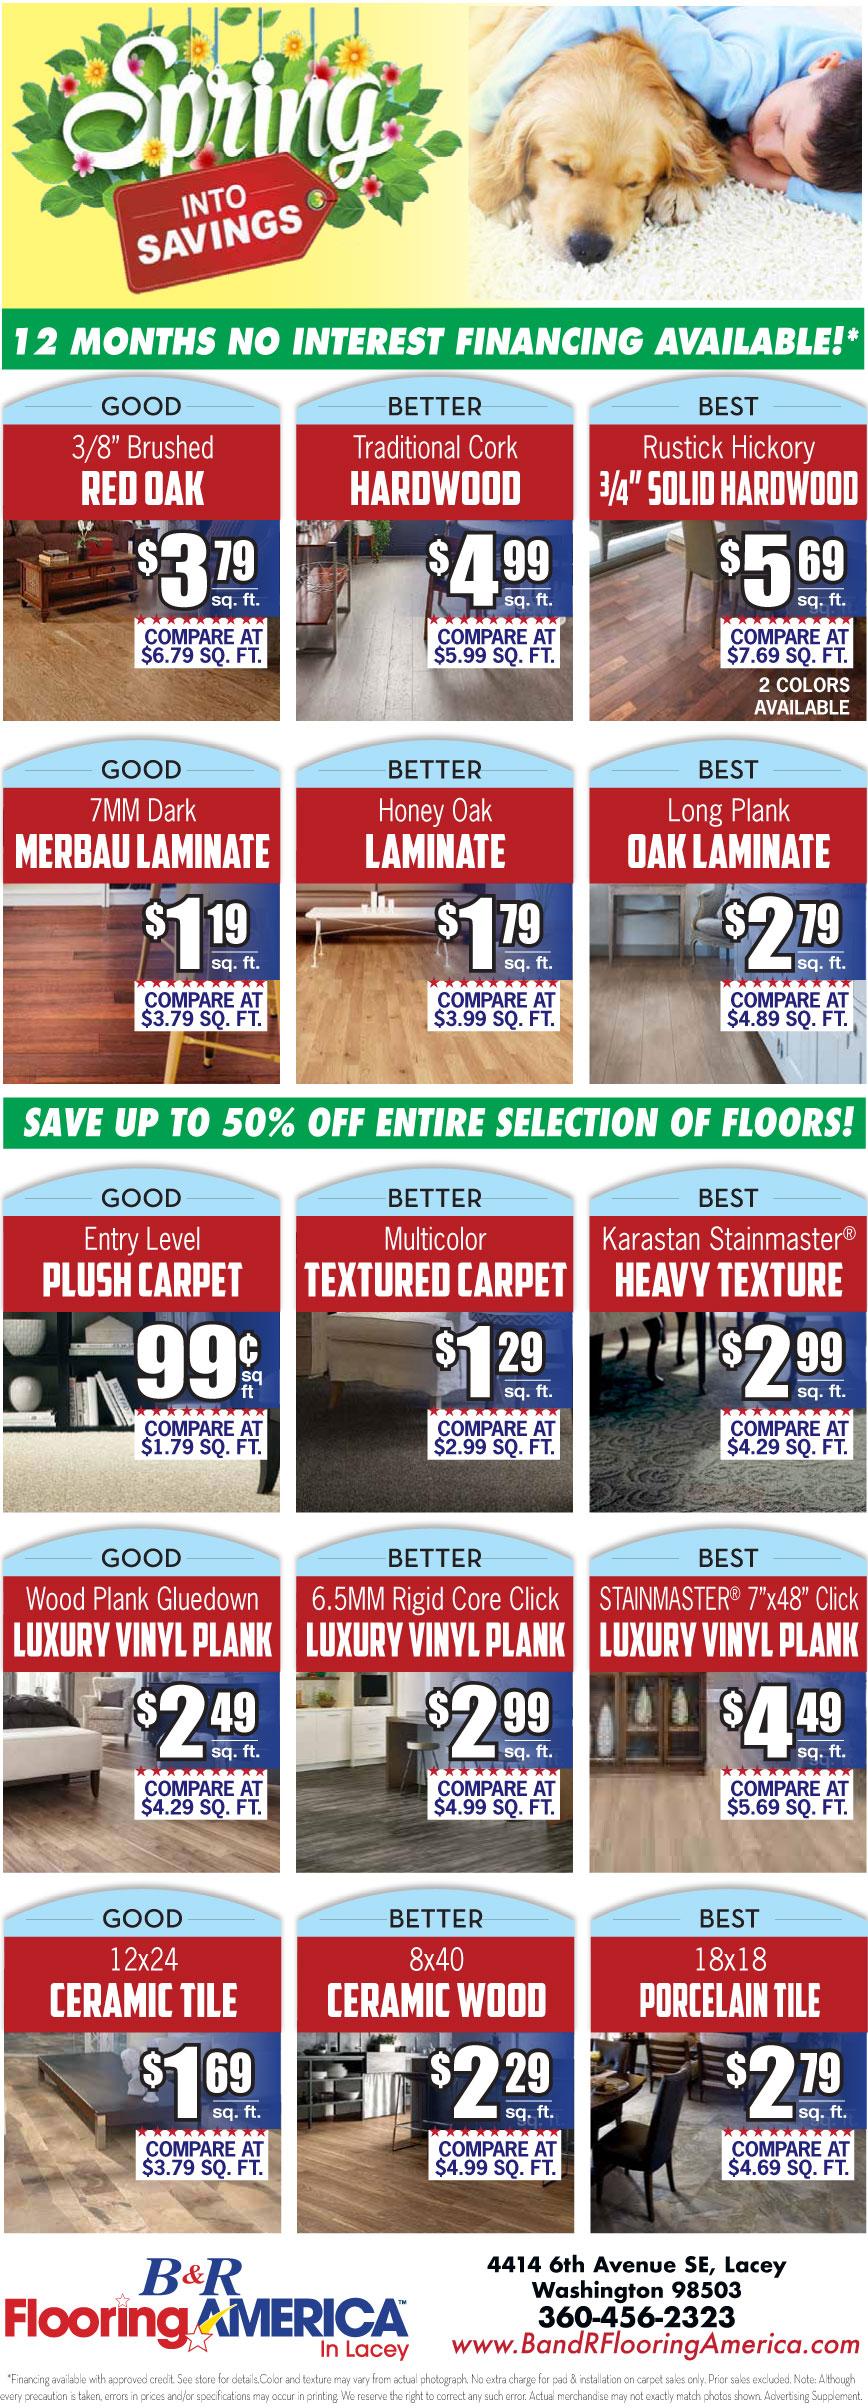 Hardwood, laminate, carpet, luxury vinyl plank and ceramic flooring